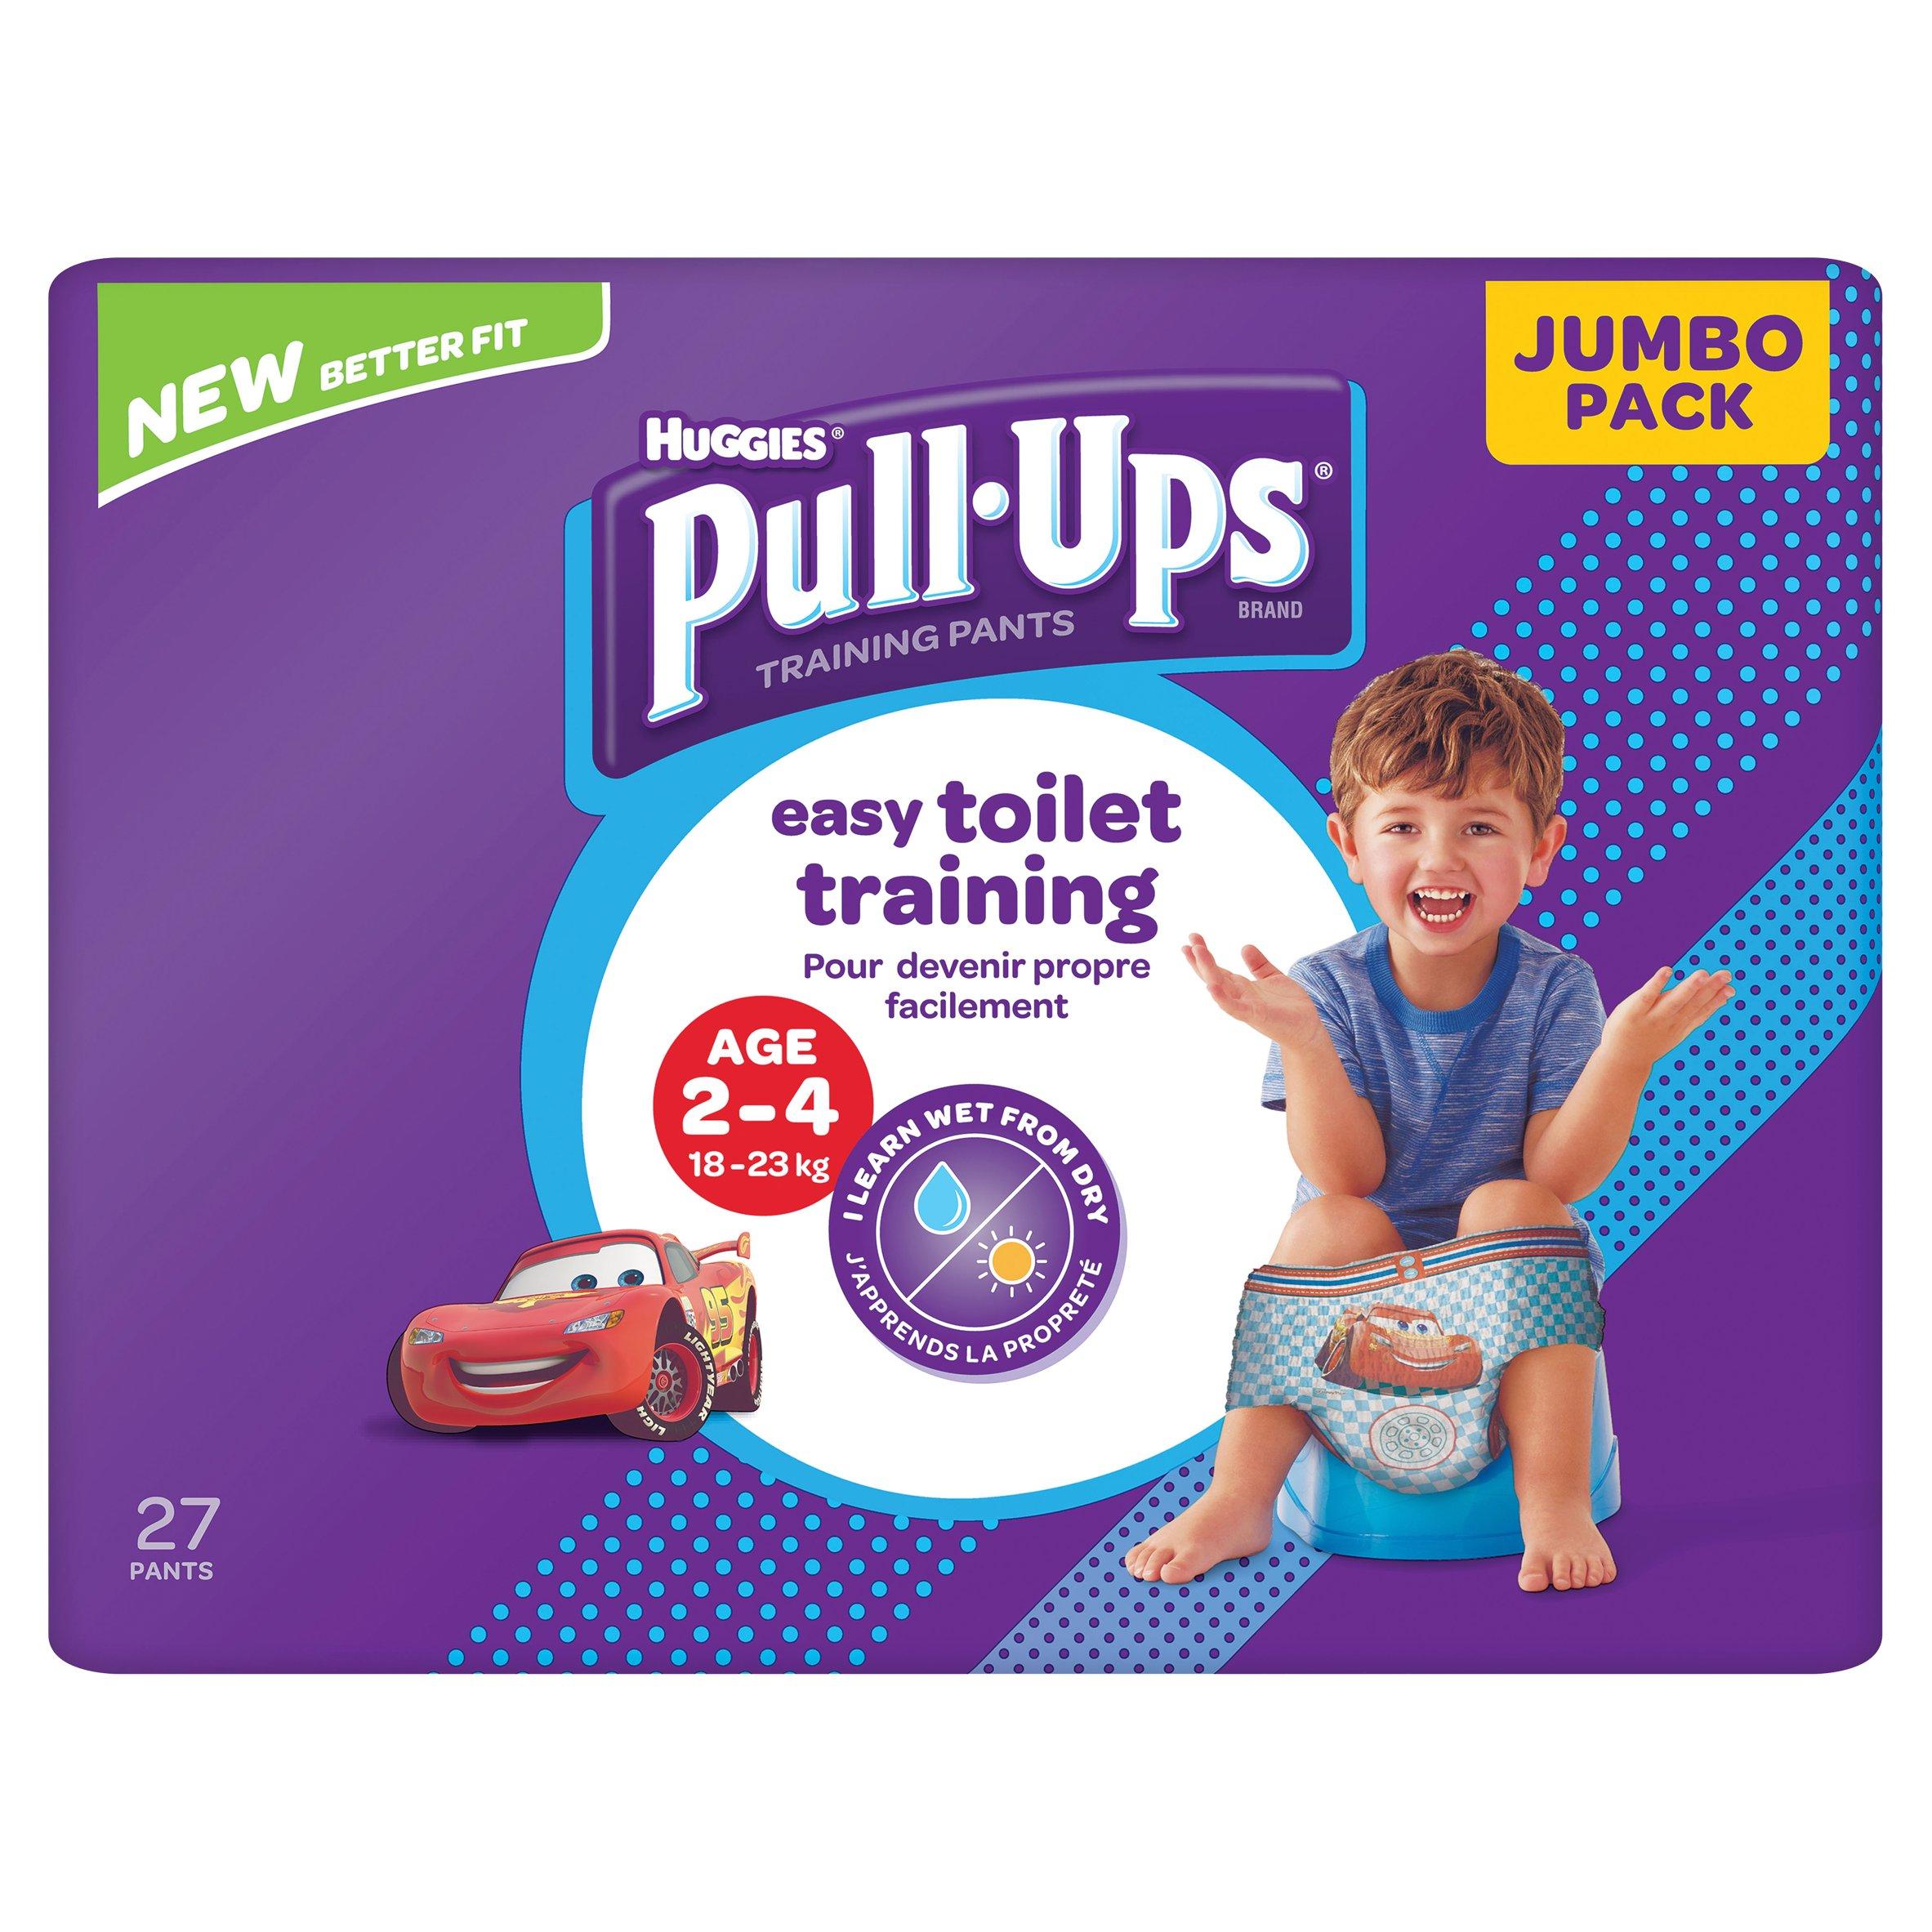 Huggies Pull Ups Night Time Boy 2-4 Years Potty Training Pants